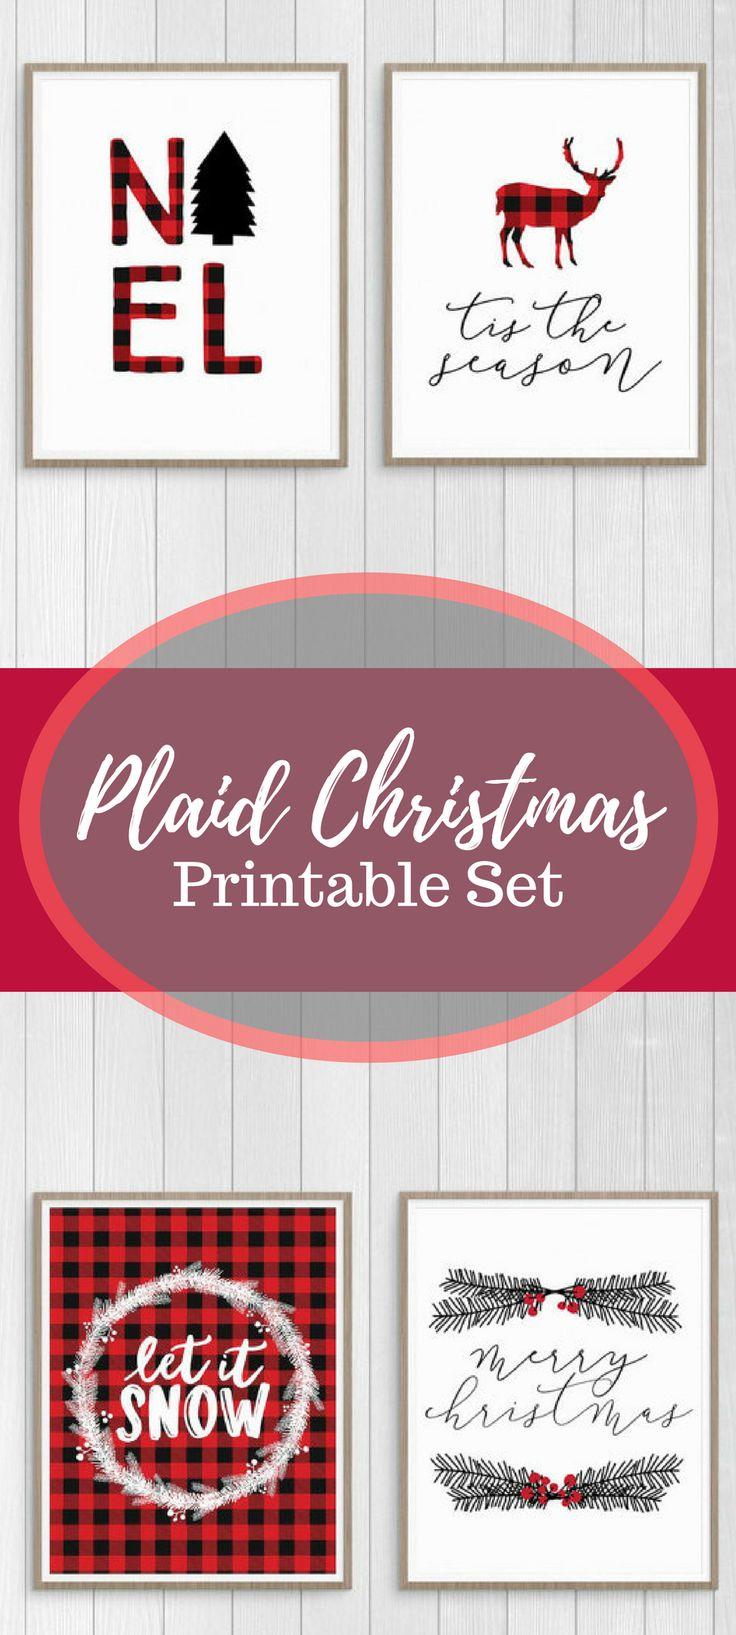 Plaid Christmas Printable Set, Red Plaid Christmas Decor, Plaid Holiday Wall Art Prints, NOEL, Let it Snow, Tis the Season, Merry Christmas #afflink